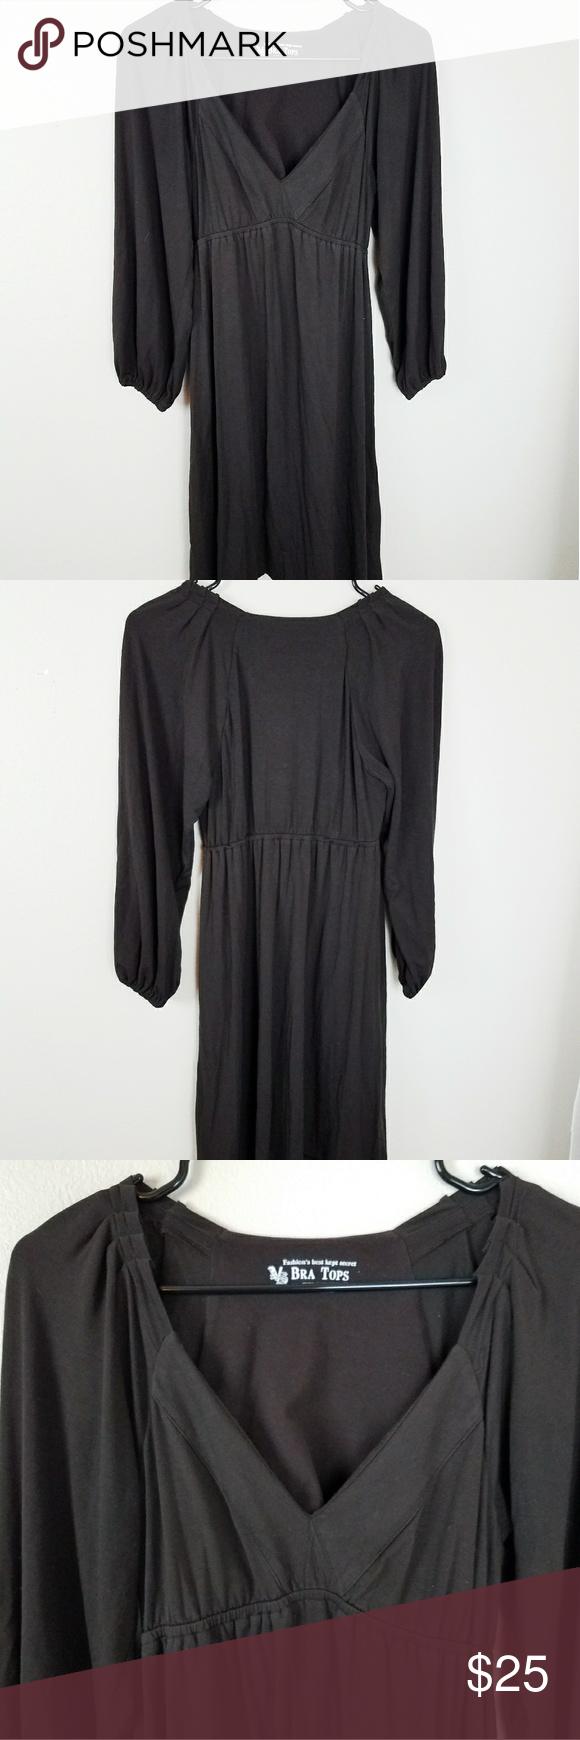 Victoriaus secret bra tops dark brown dress xsmall my posh picks